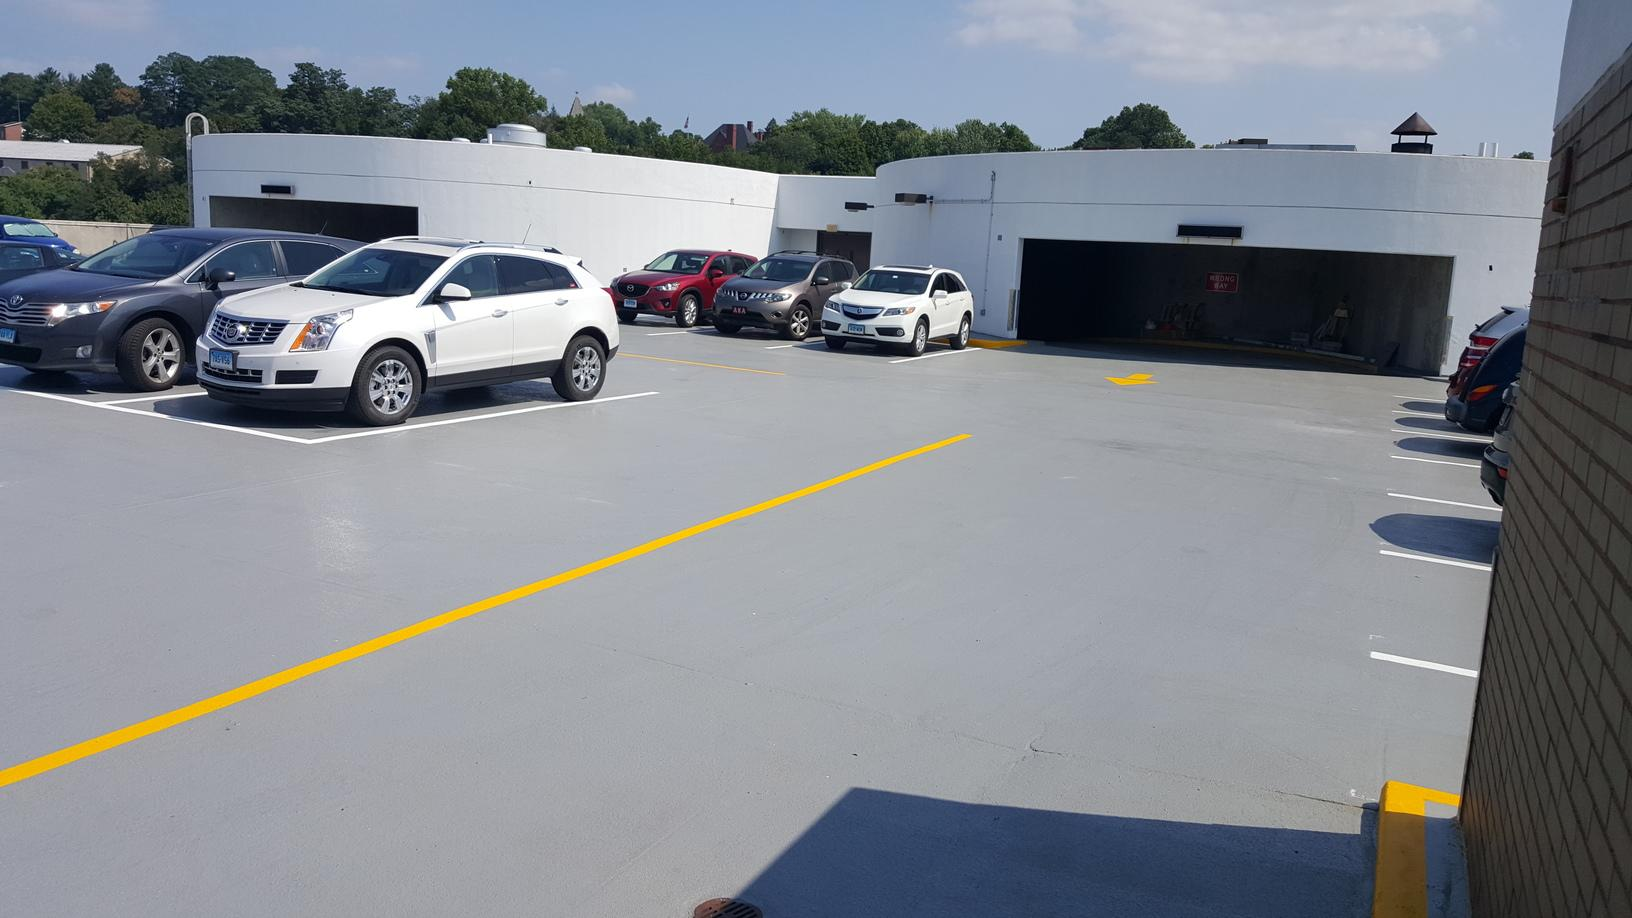 Completed Garage Deck Coating in Bristol, CT